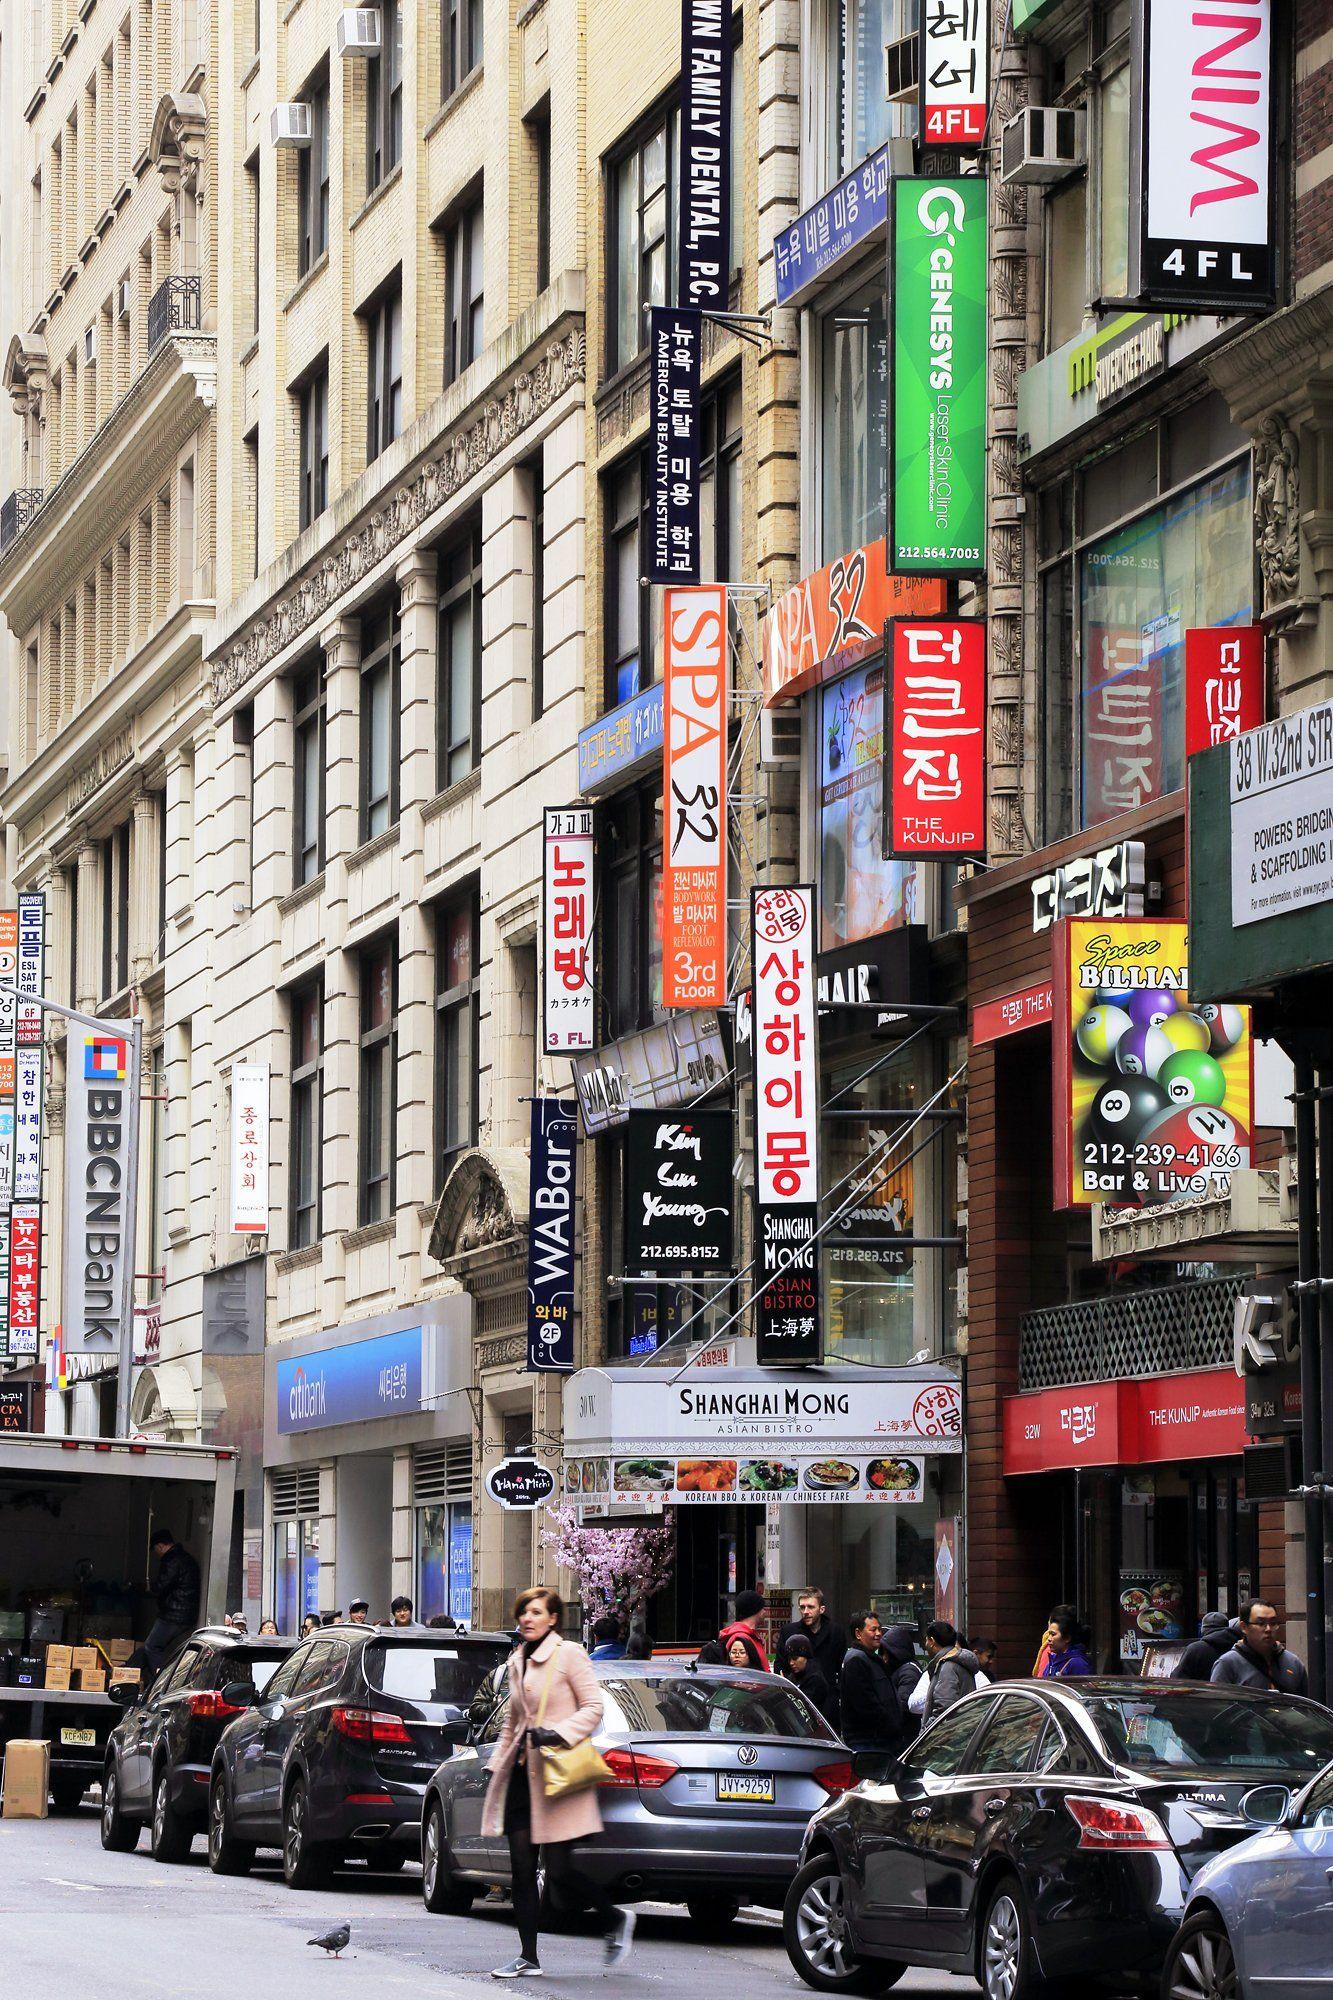 A Food Crawl Through New York's Koreatown